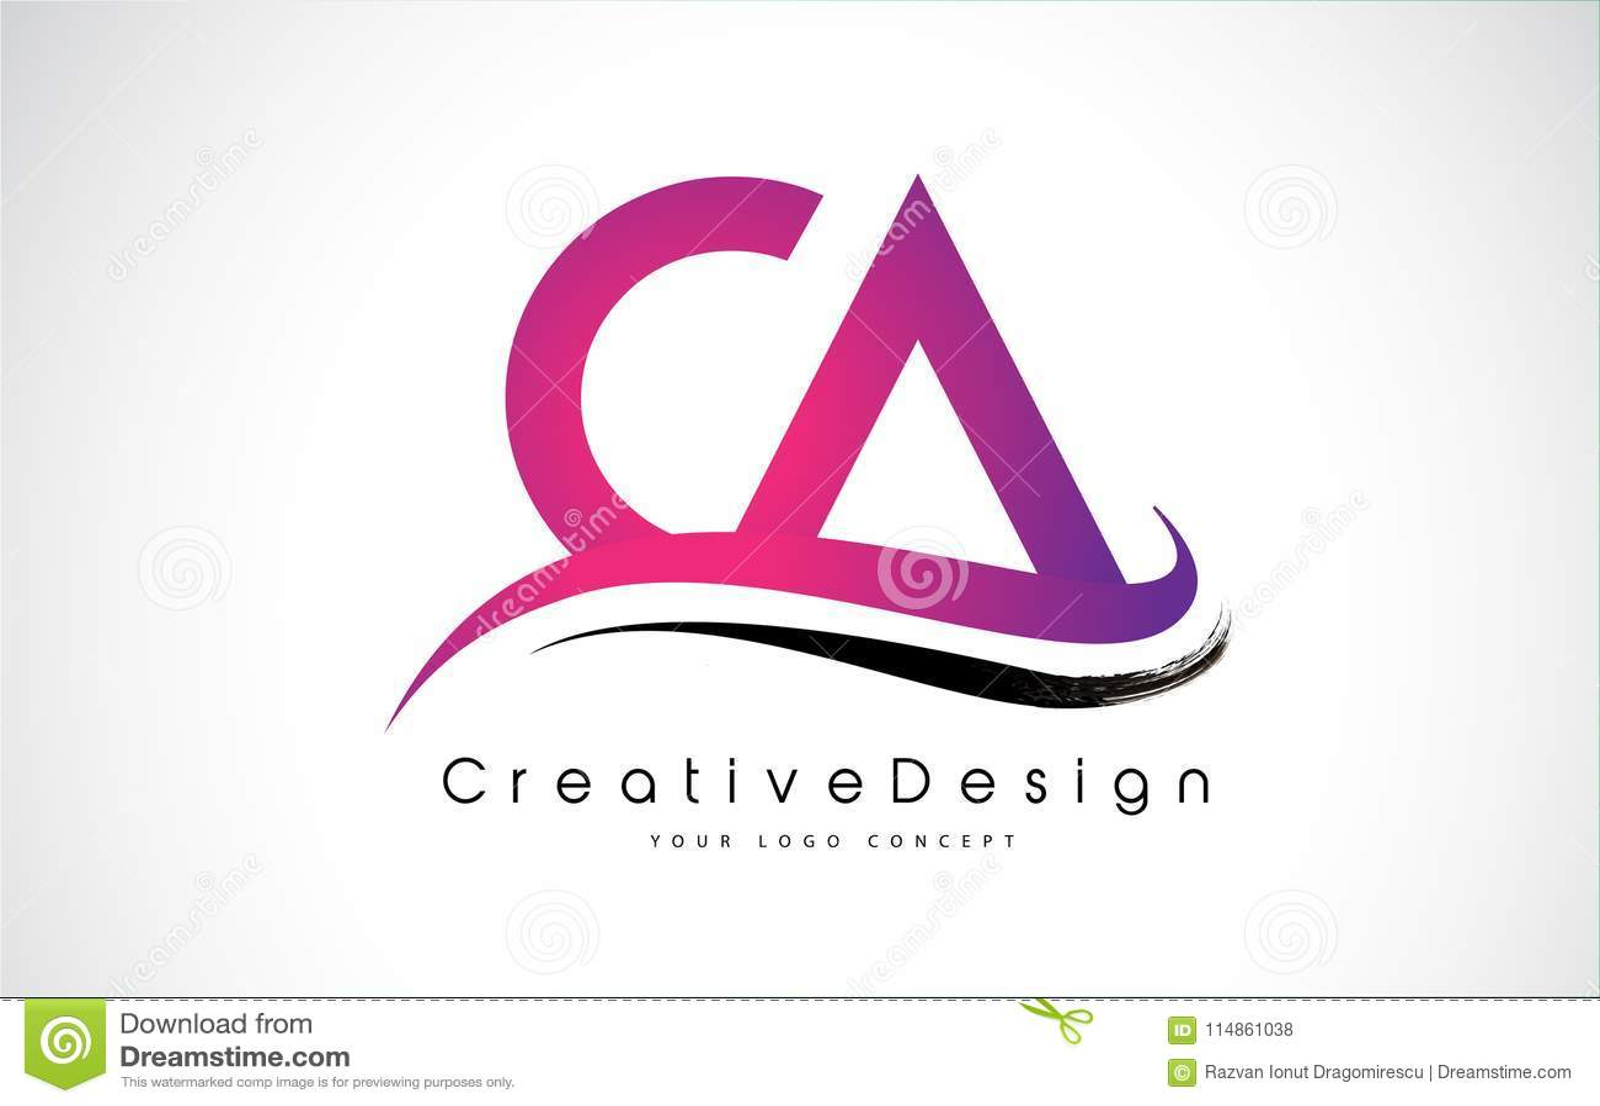 CA Letter Logo Design In Purple Colors. Stock Vector - Illustration ...